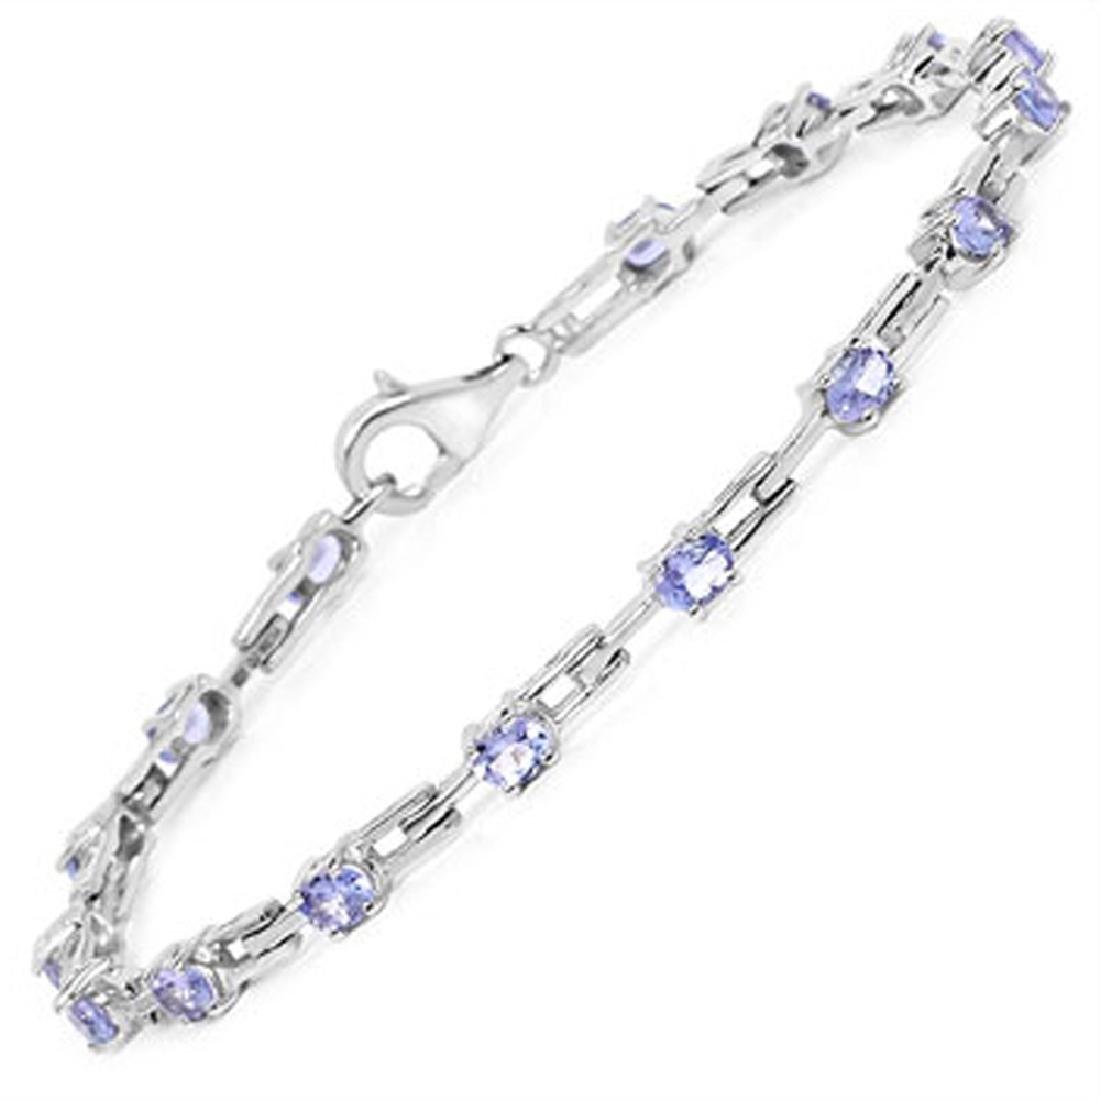 APP: 2.1k Fine Jewelry 2.72CT Oval Cut Tanzanite And